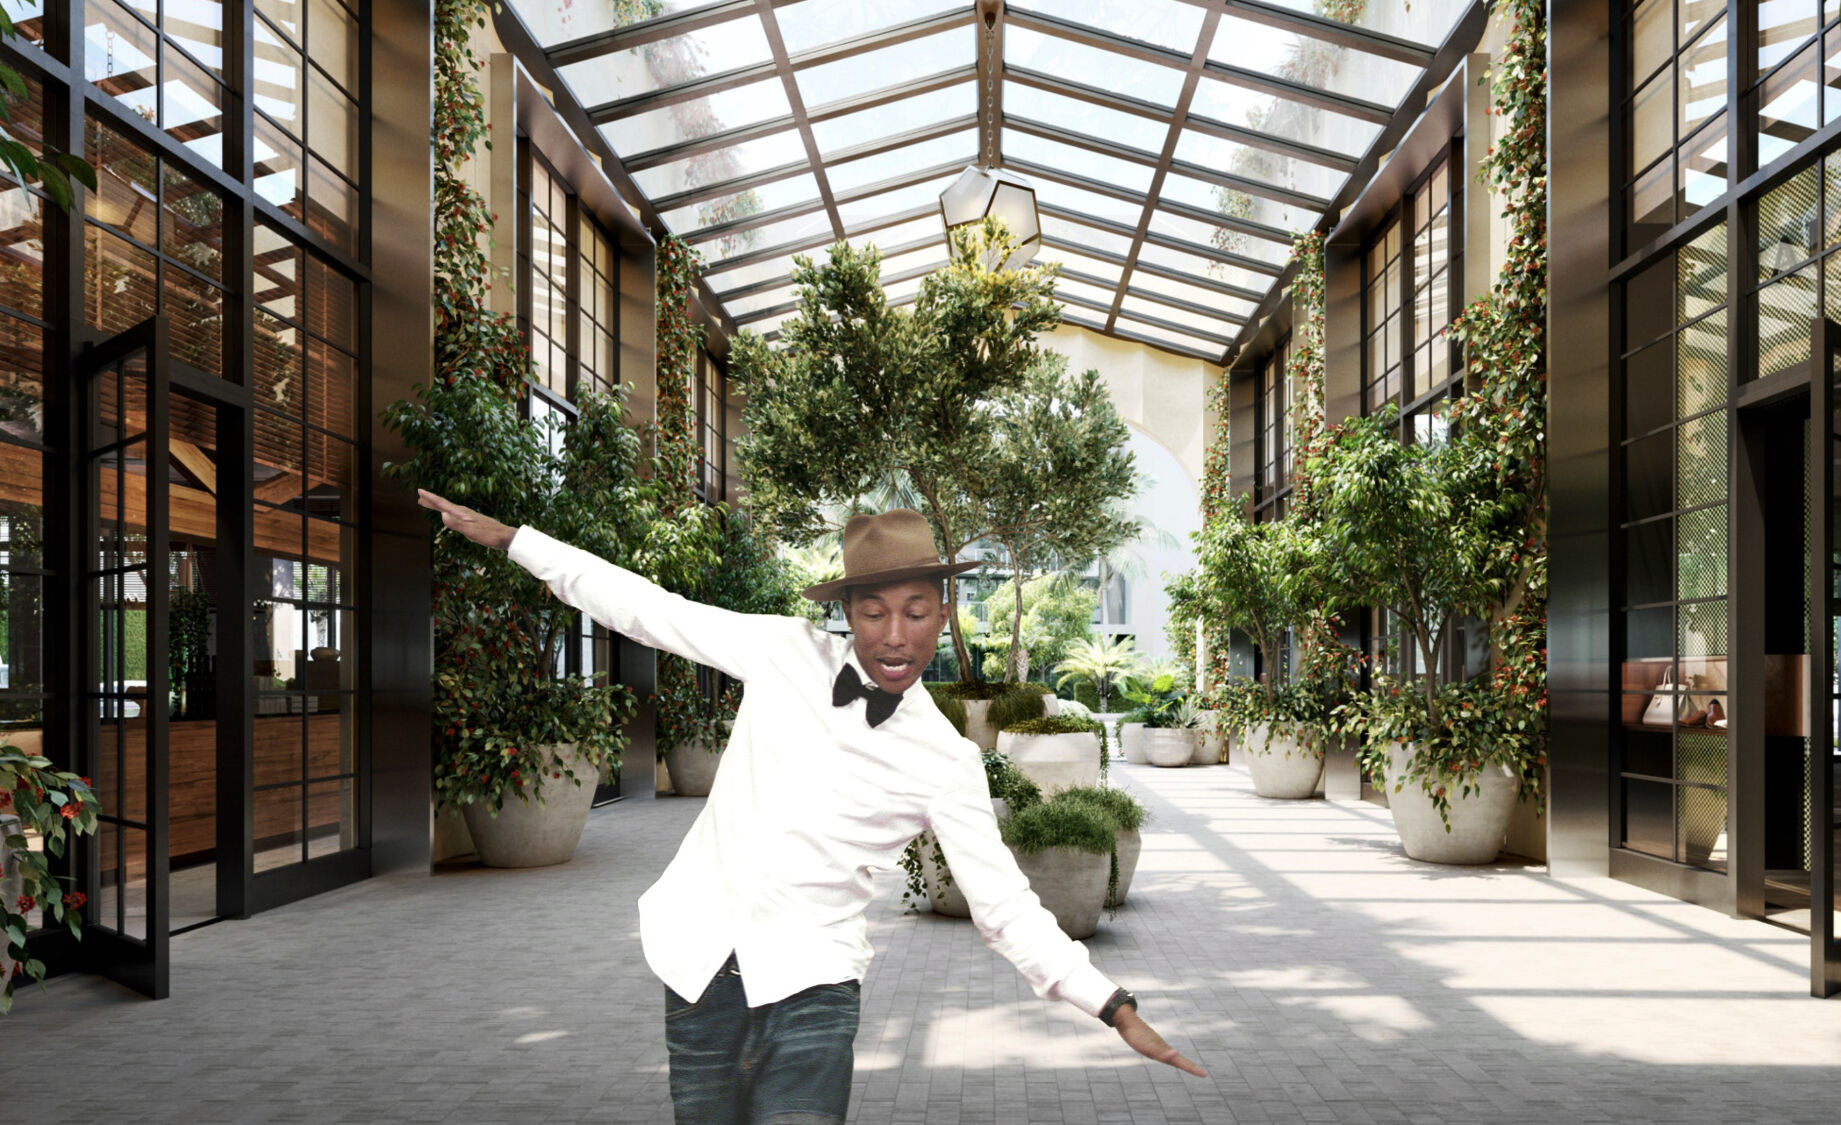 """Happy"" singer Pharrell Williams opens Goodtime Hotel in Miami Beach 4/20/21"